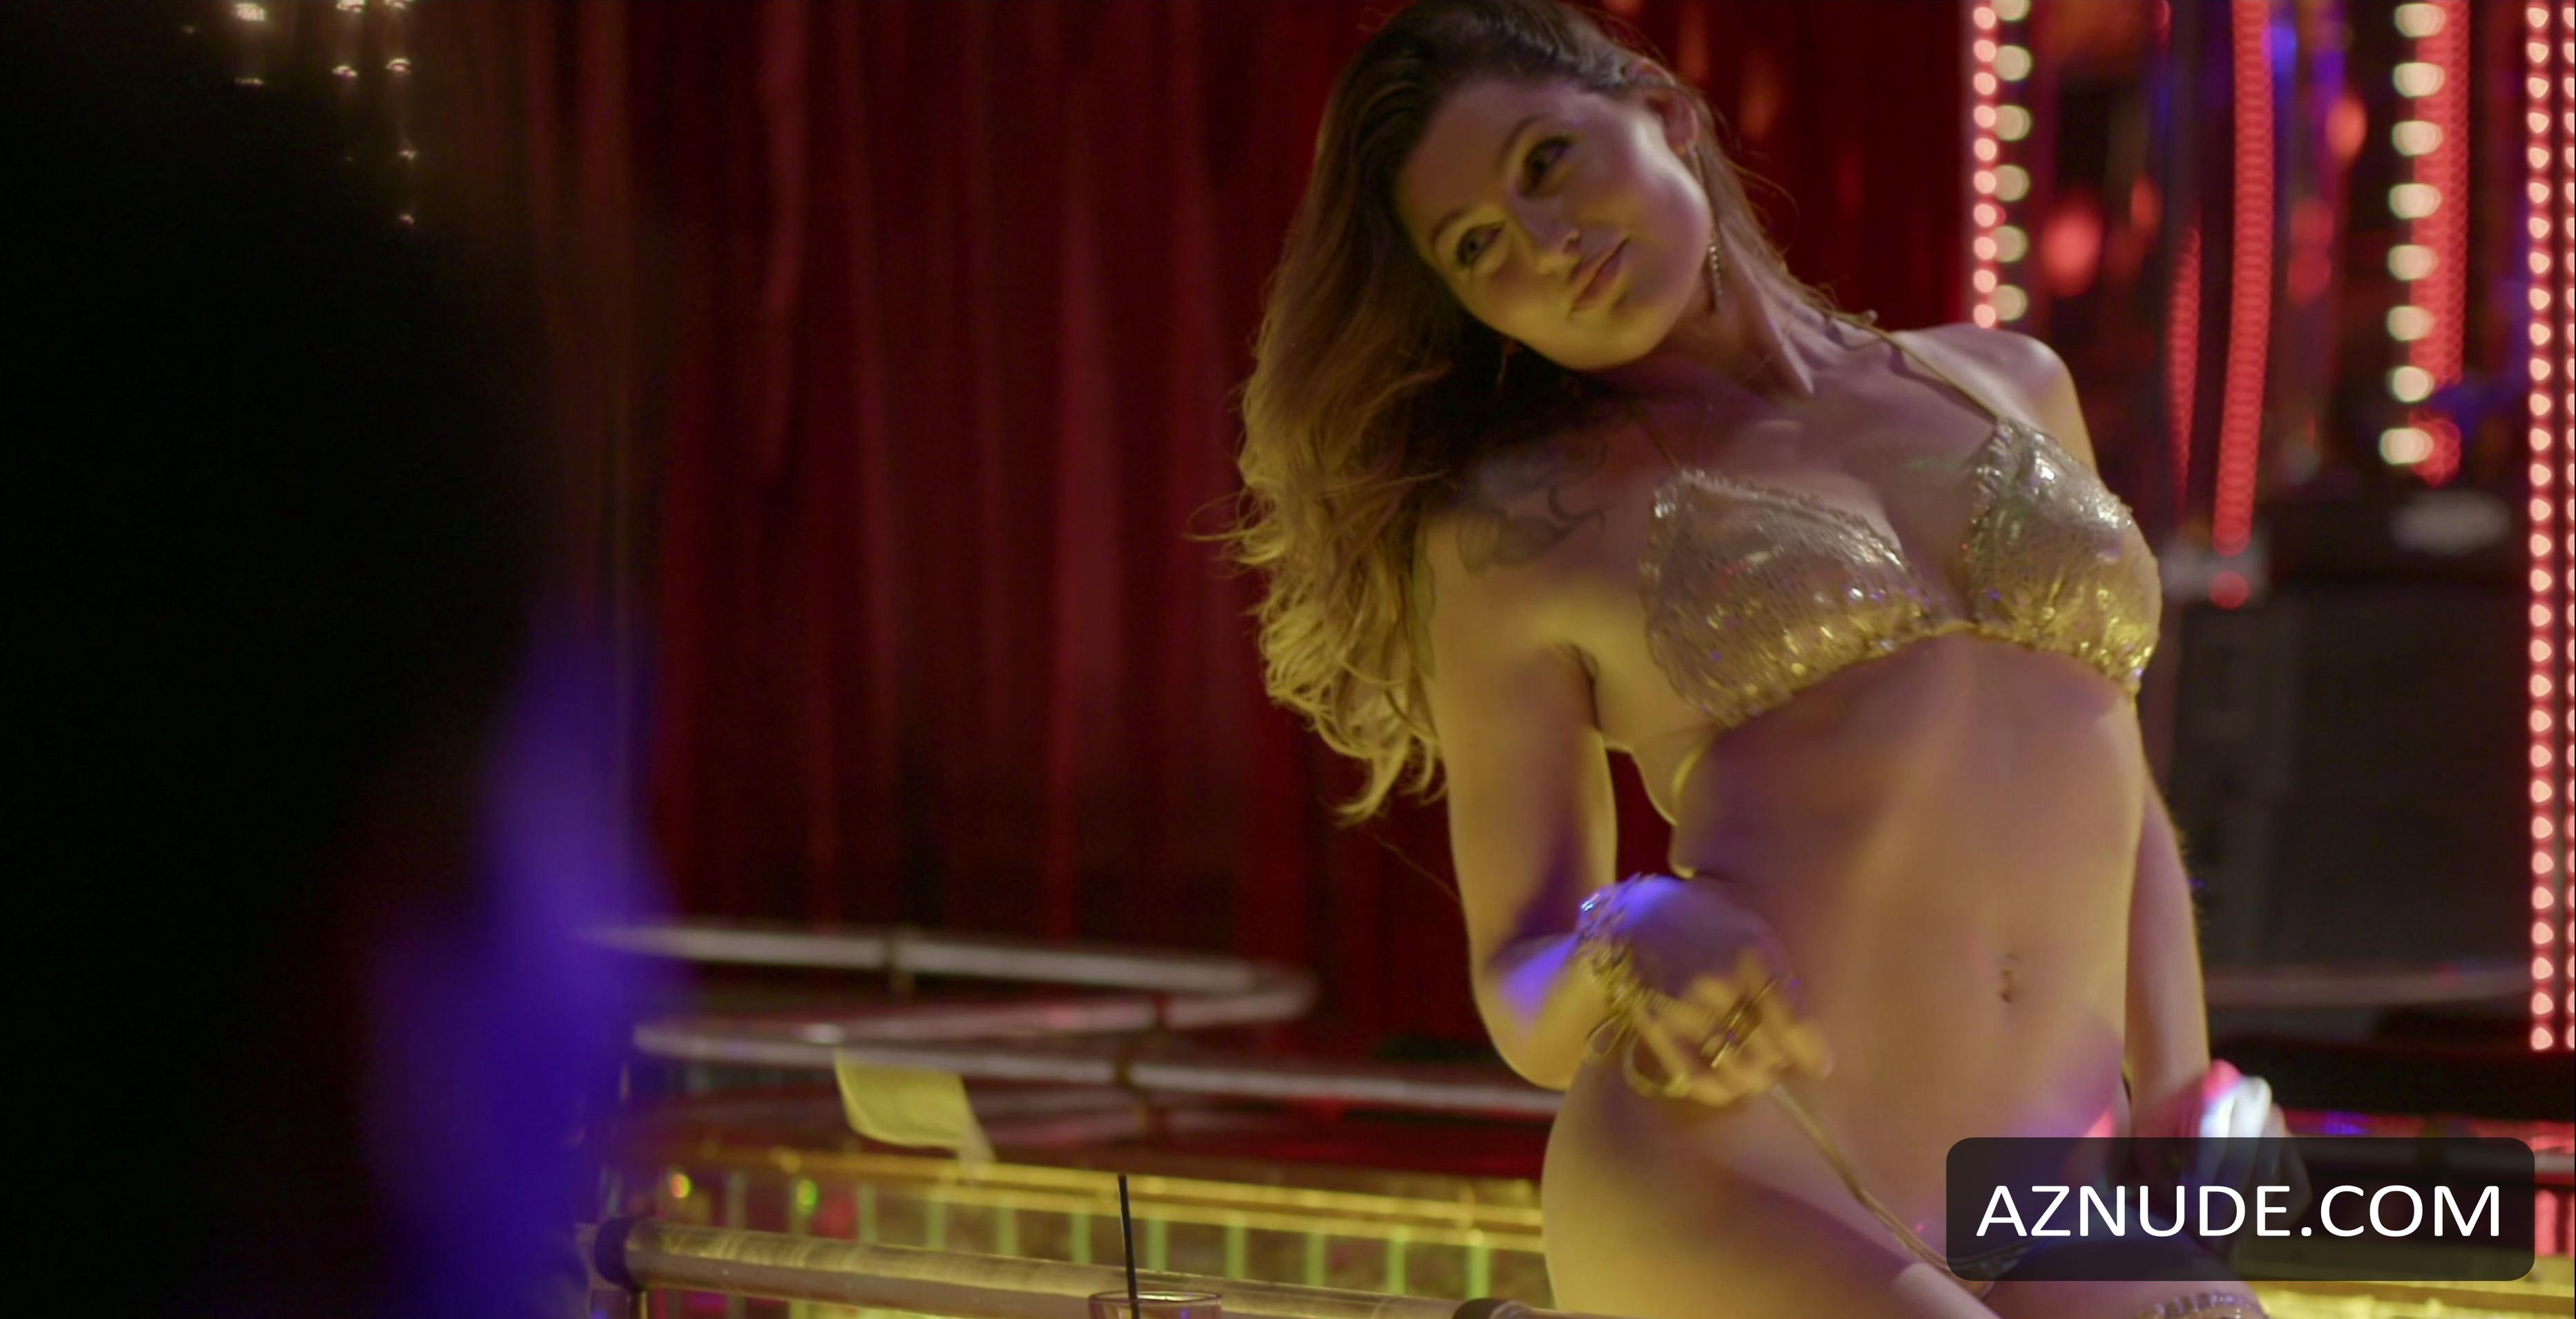 Nude photo of hot women